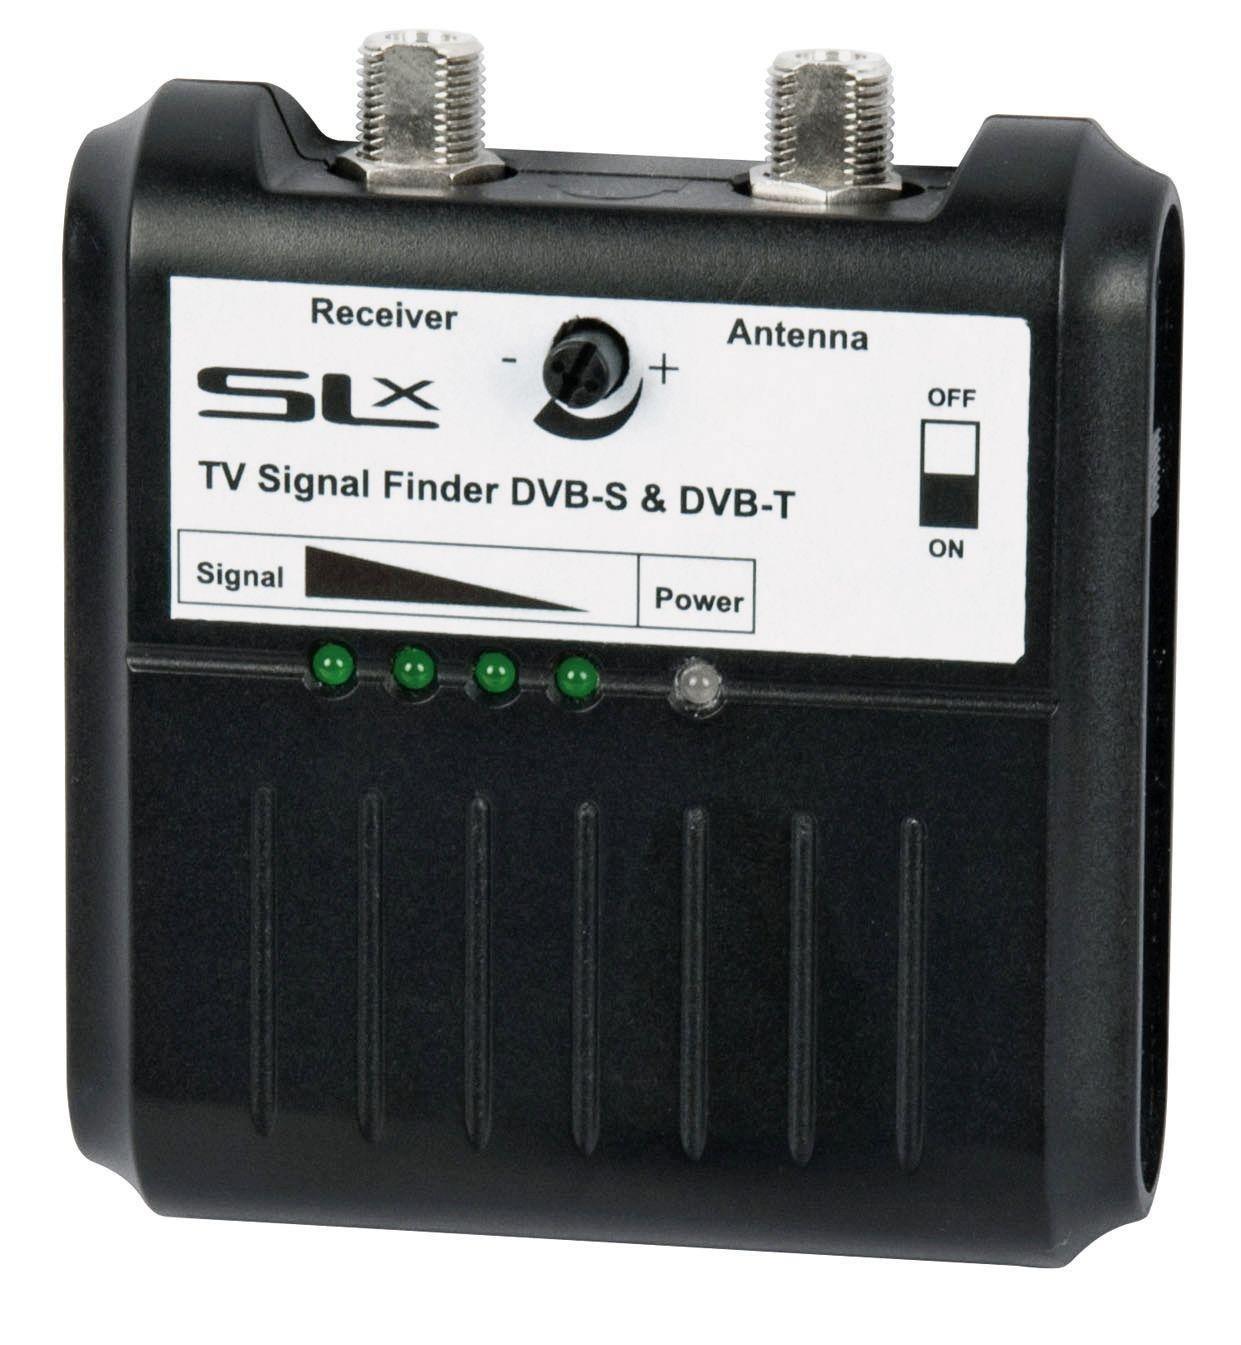 SLx SLx - Digital - TV and Satellite Aerial Signal Detector